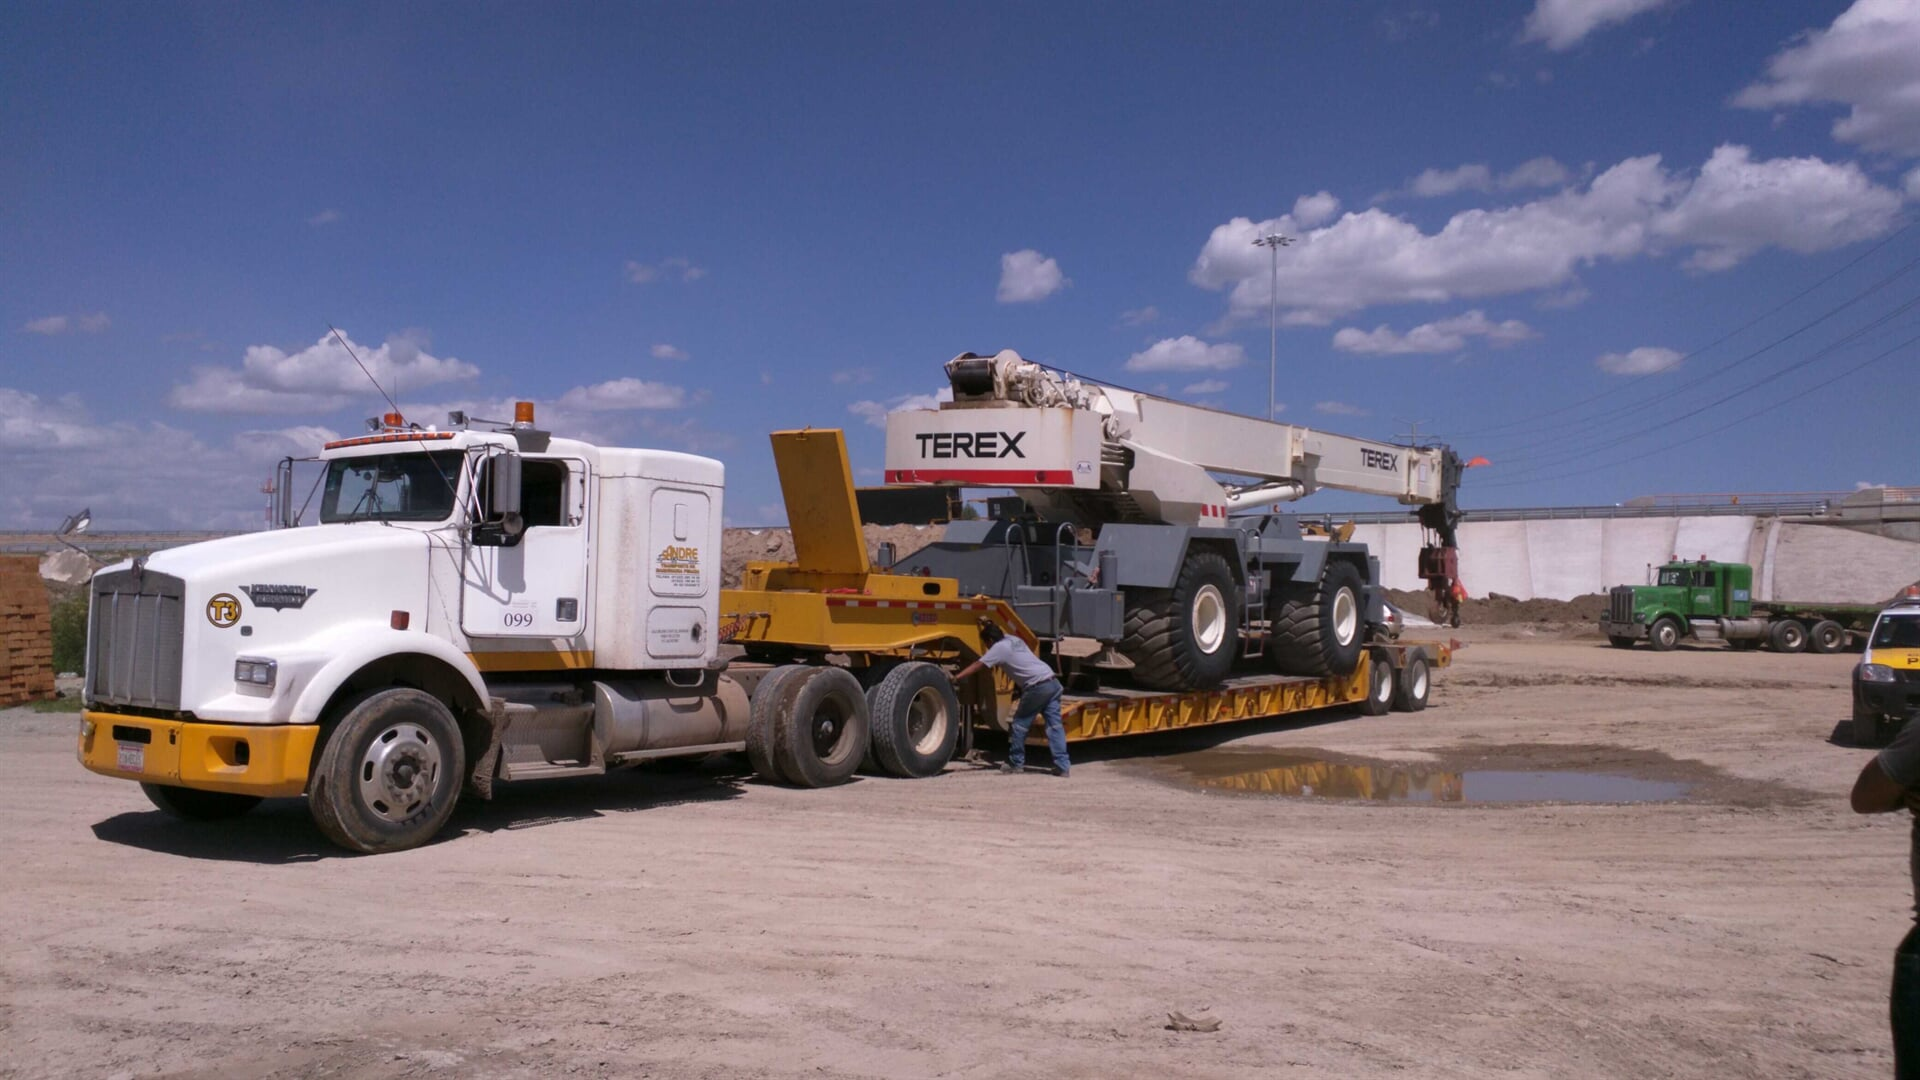 SANDRE TRANSPORTE DE MAQUINARIA - ideal para traslado de cargas